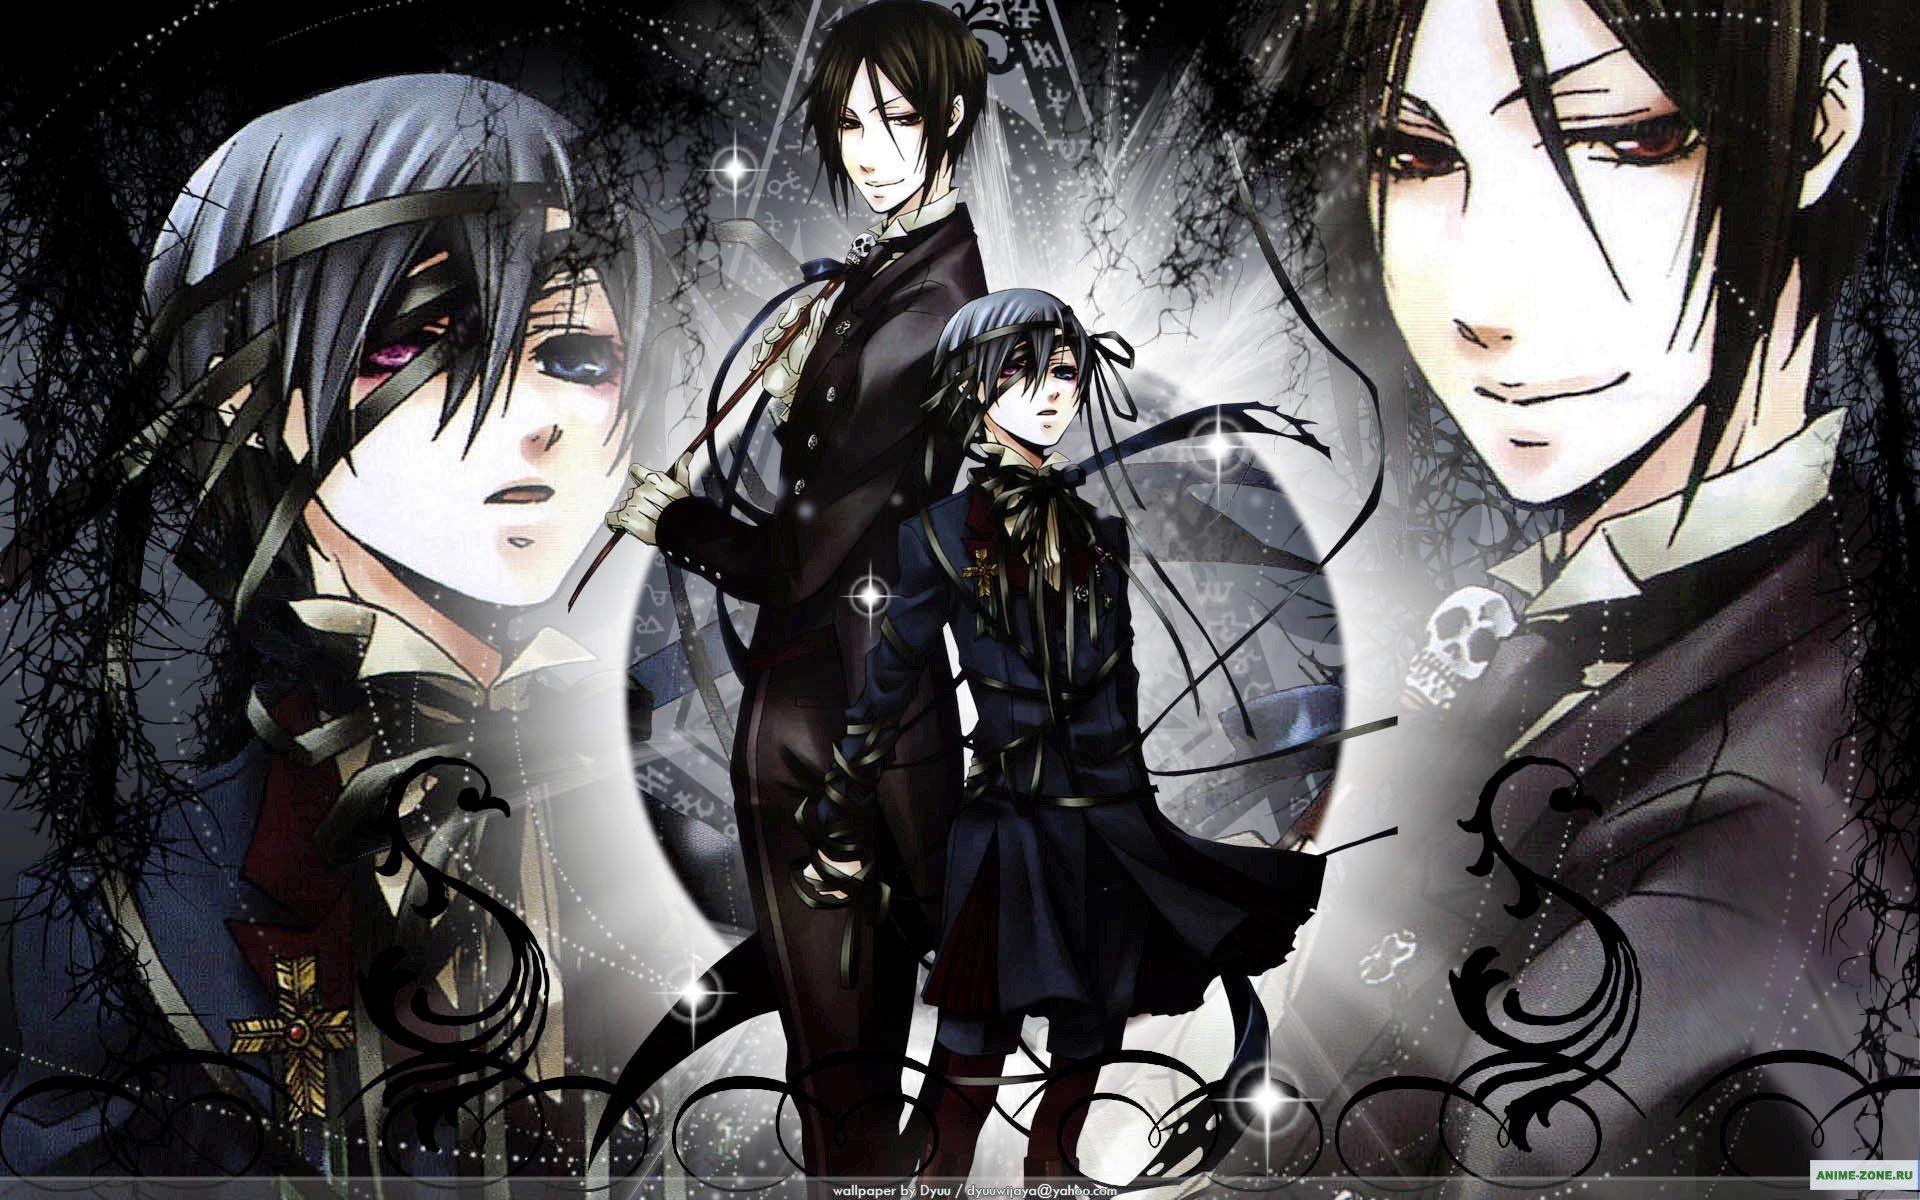 Kuroshitsuji images Black Butler HD wallpaper and background photos